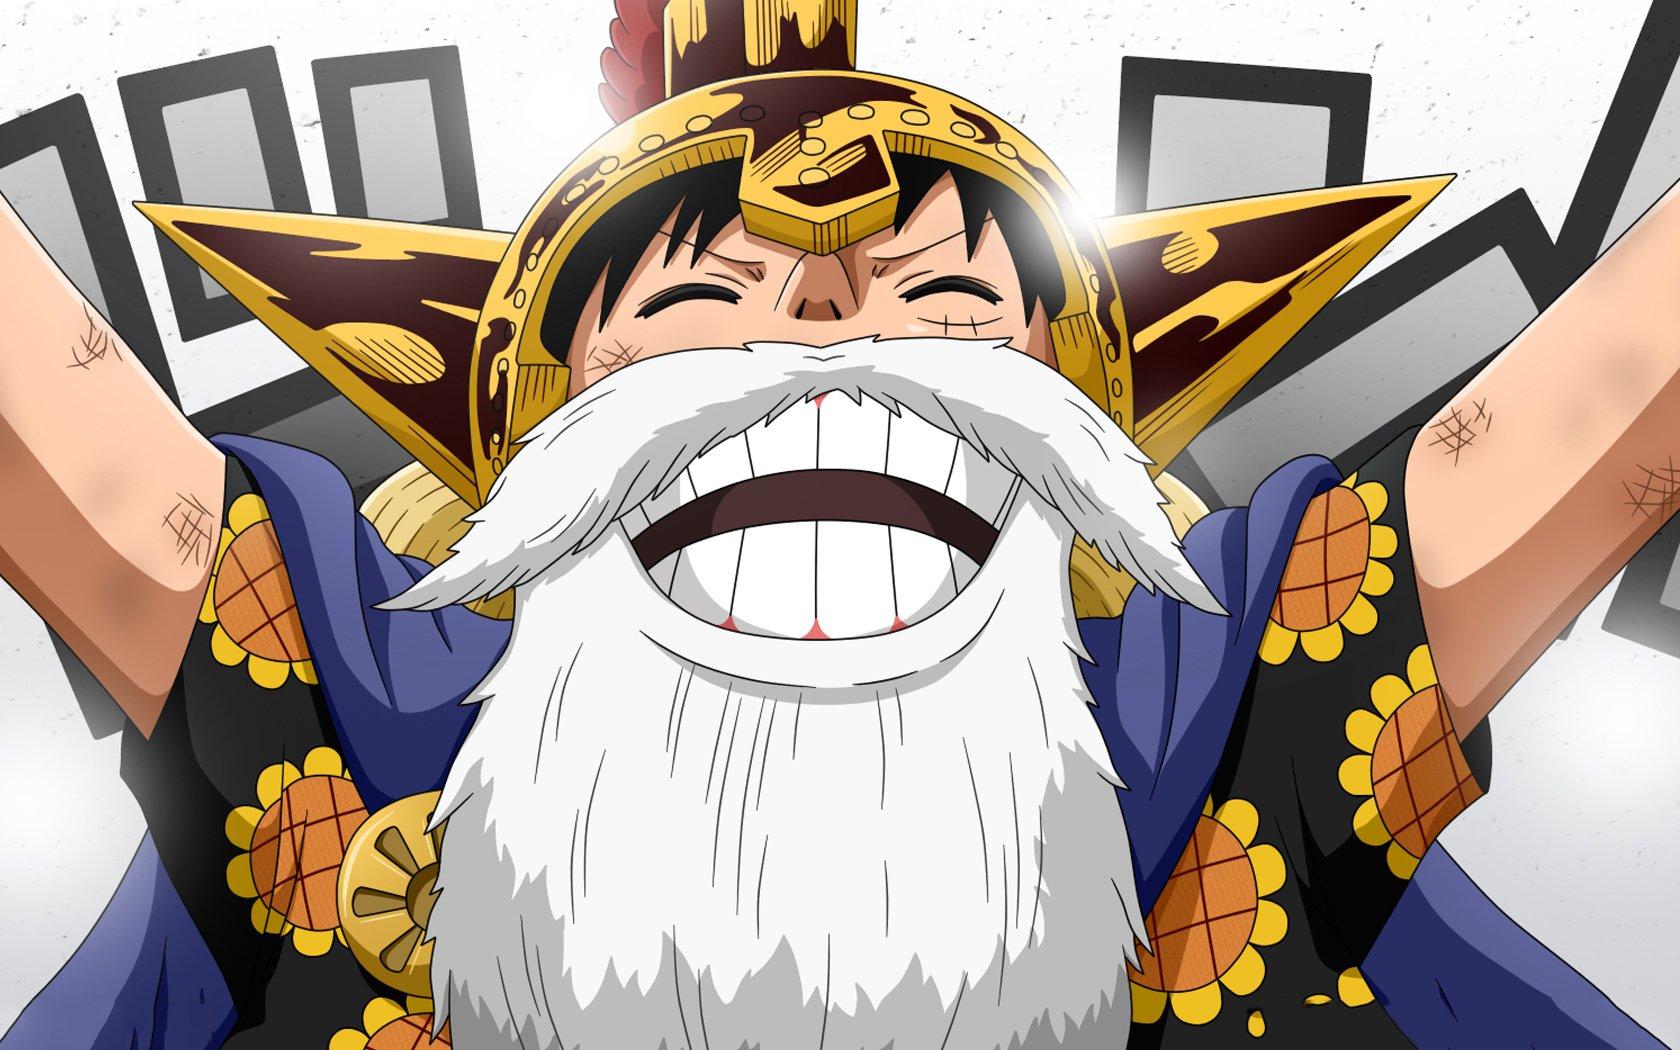 One Piece Iphone X Wallpaper Lucy Monkey D Luffy Fond D 233 Cran And Arri 232 Re Plan